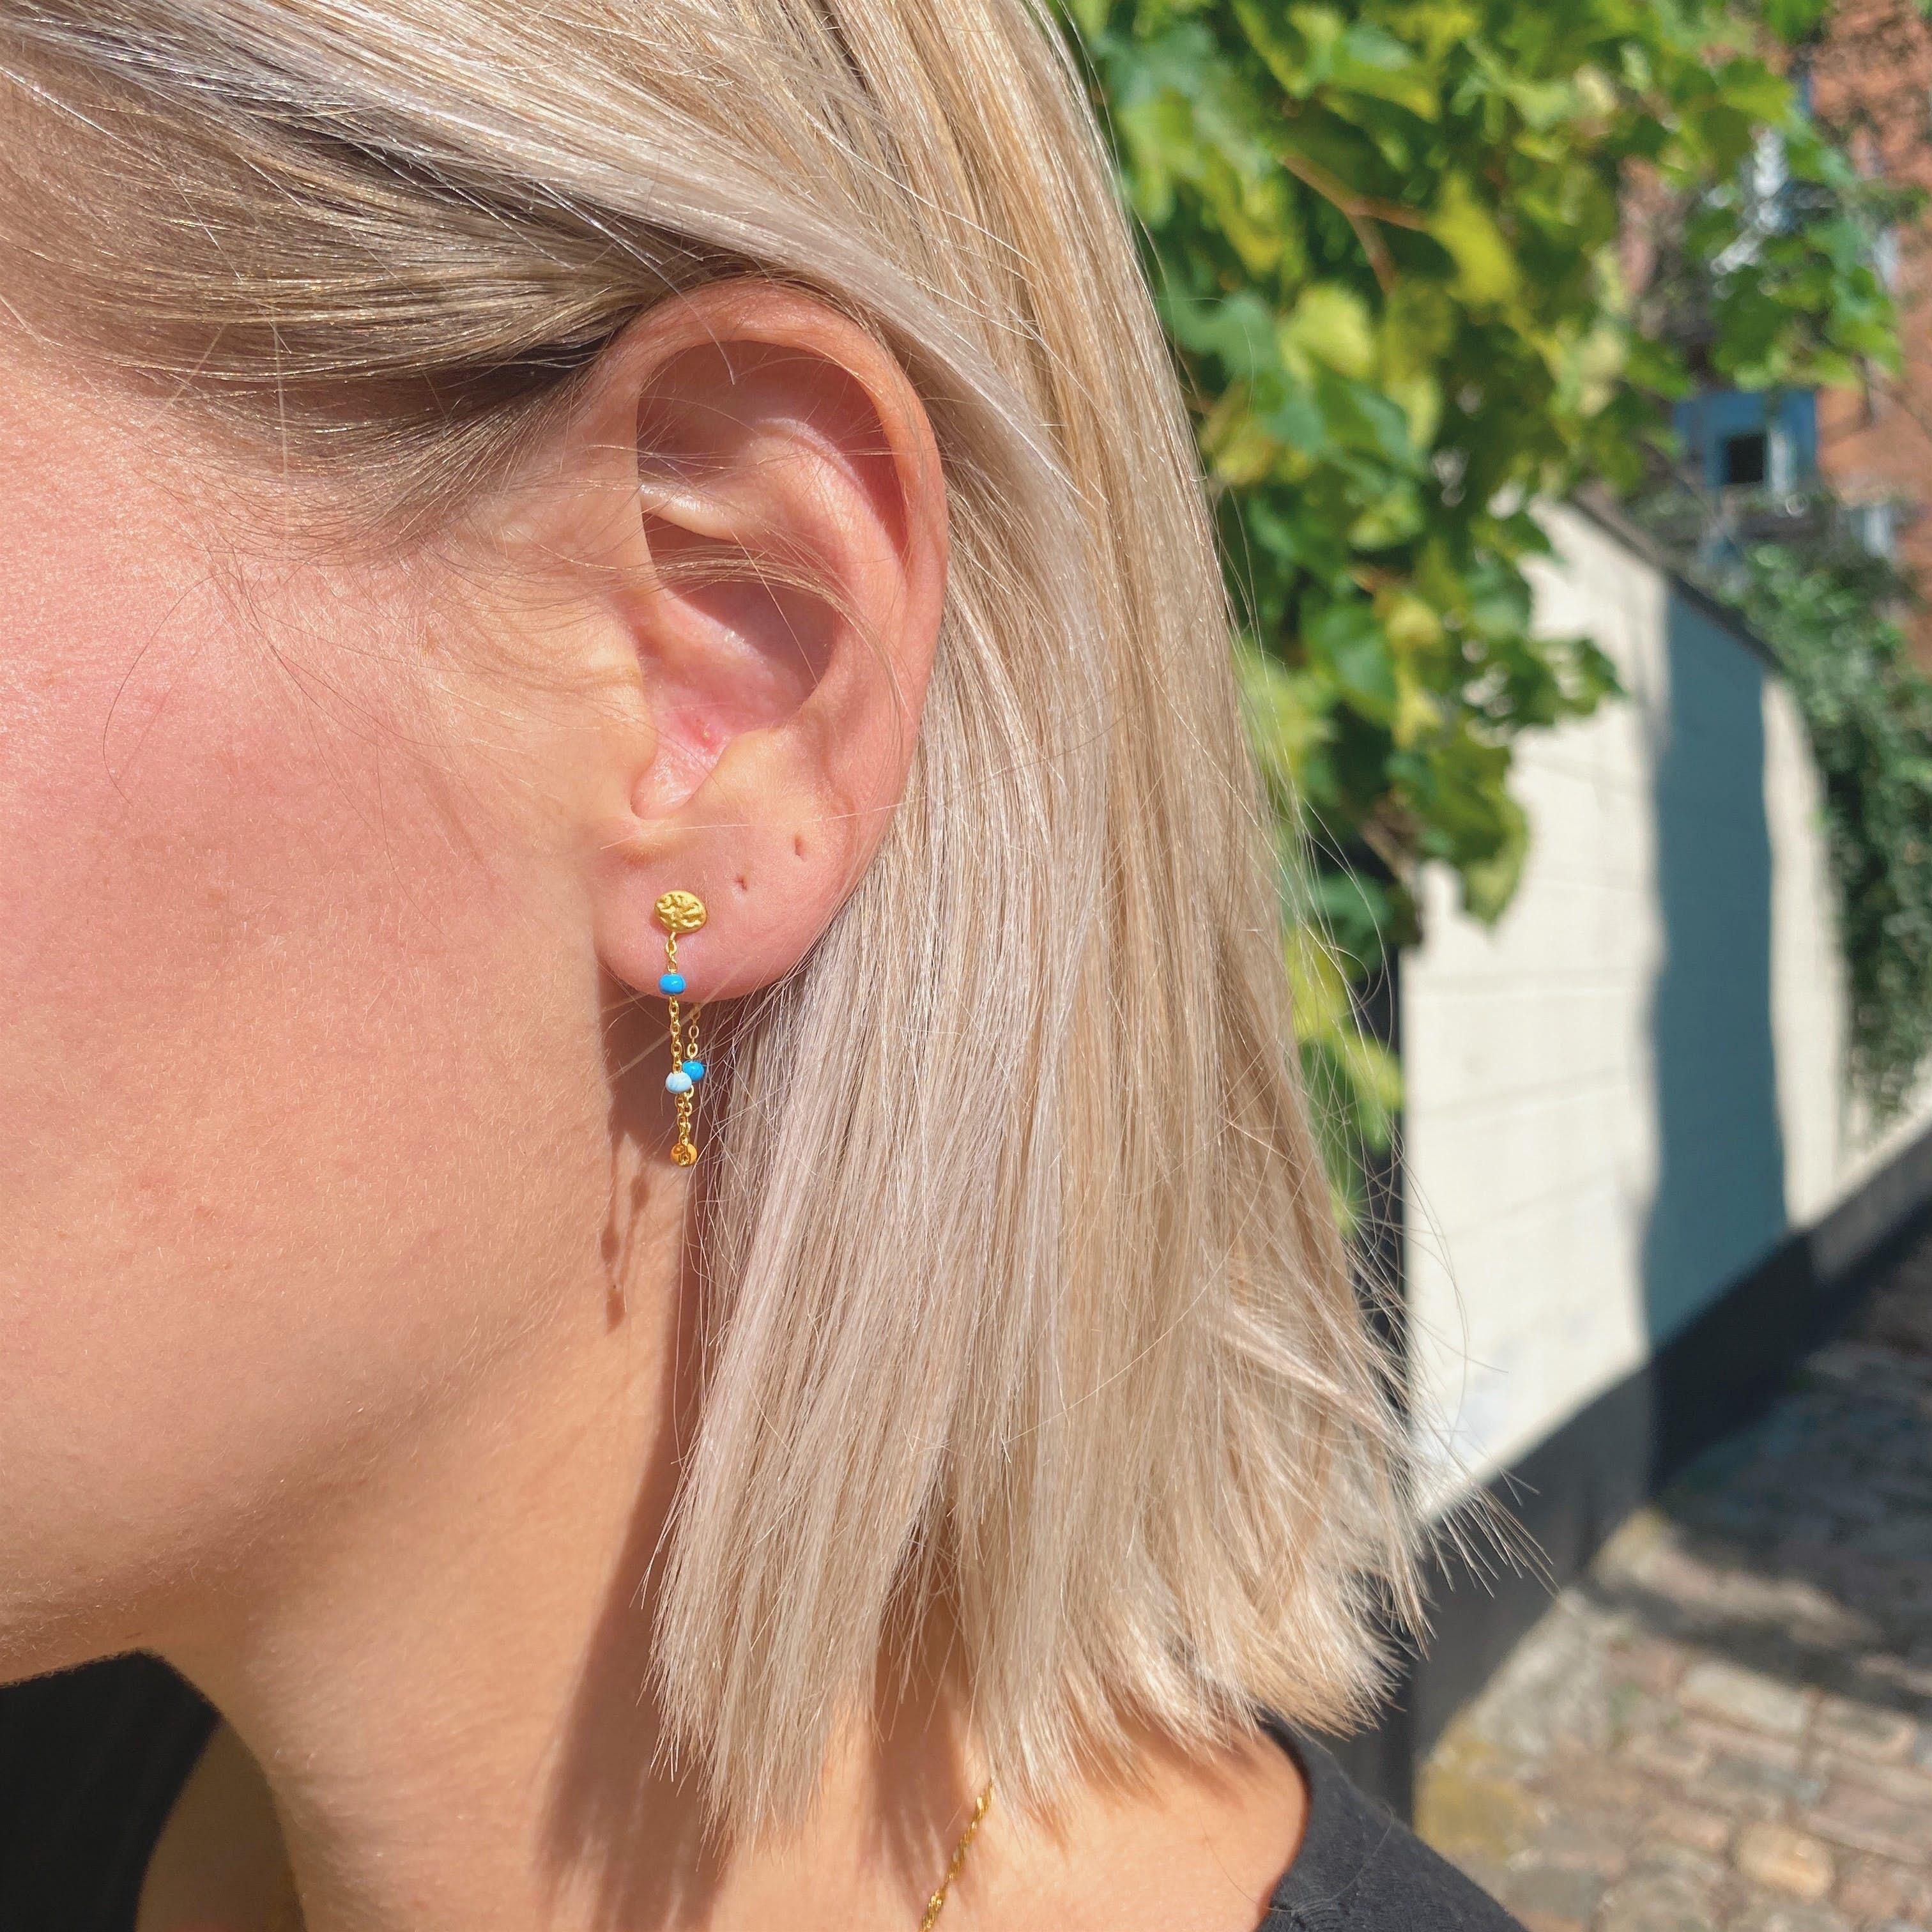 Lola Earrings Breezy von Enamel Copenhagen in Vergoldet-Silber Sterling 925